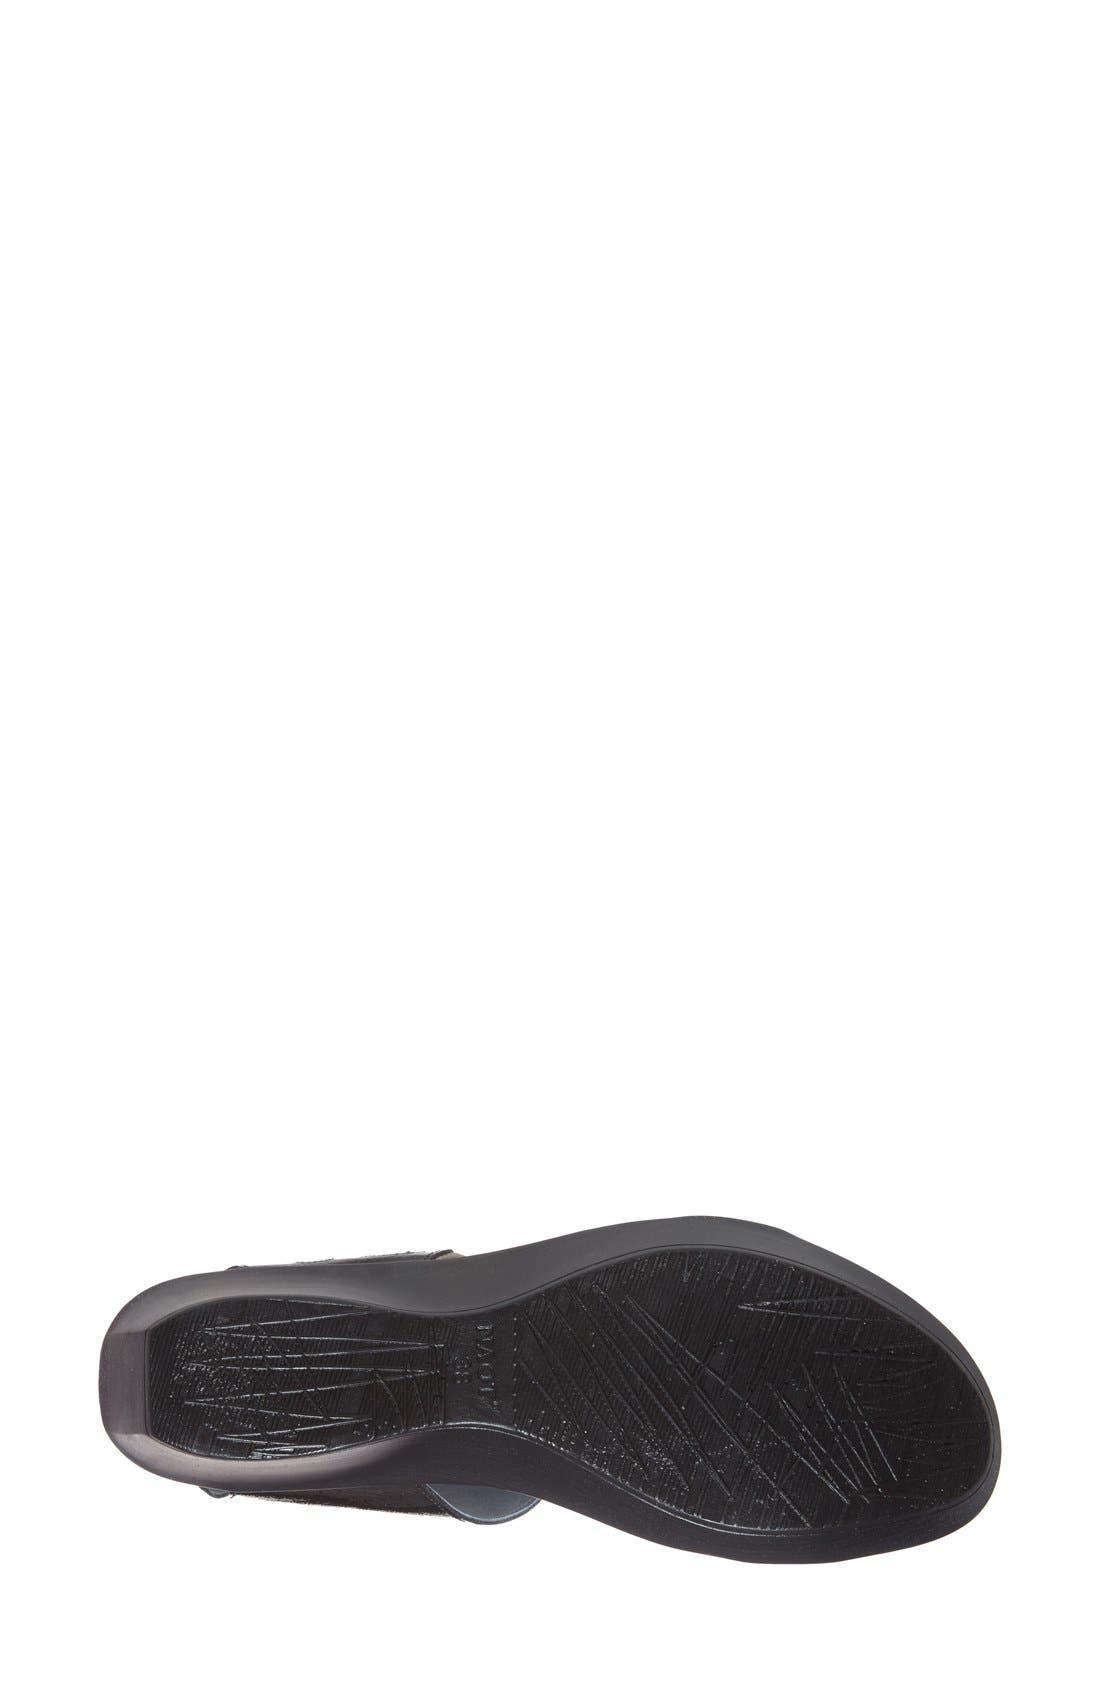 'Intrigue' Platform Wedge,                             Alternate thumbnail 4, color,                             Black Luster Leather